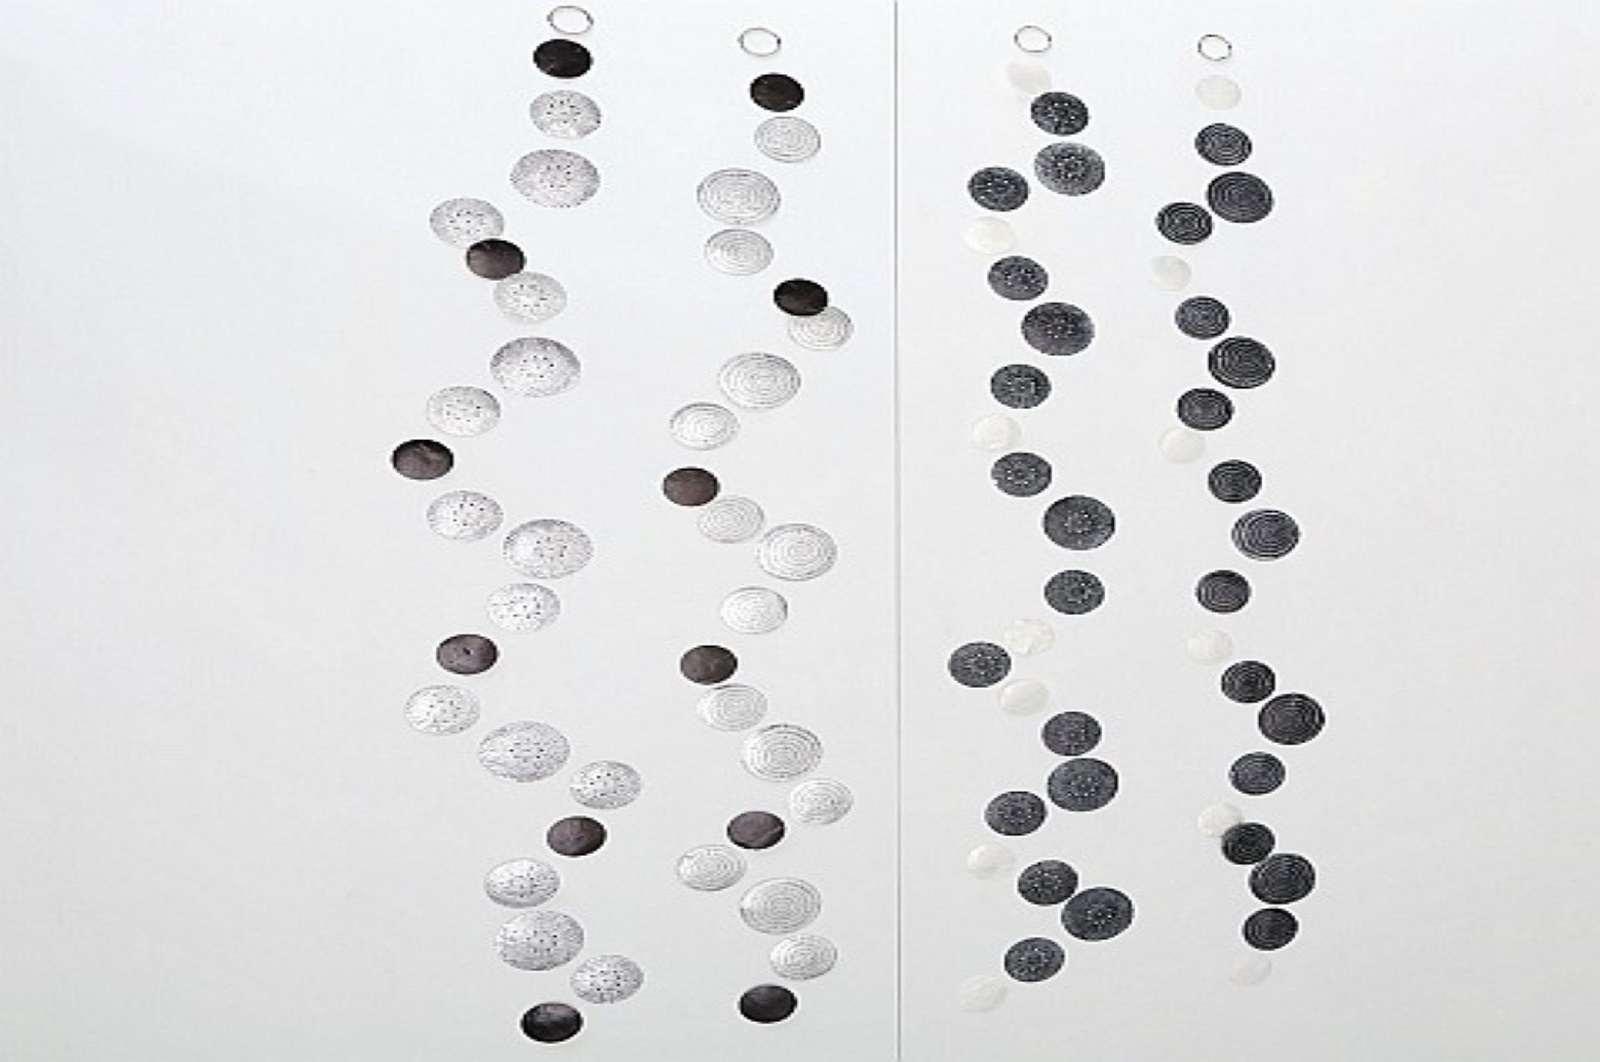 Capiz Girlande 4er-Set 2xhell+2xdunkel L:180cm